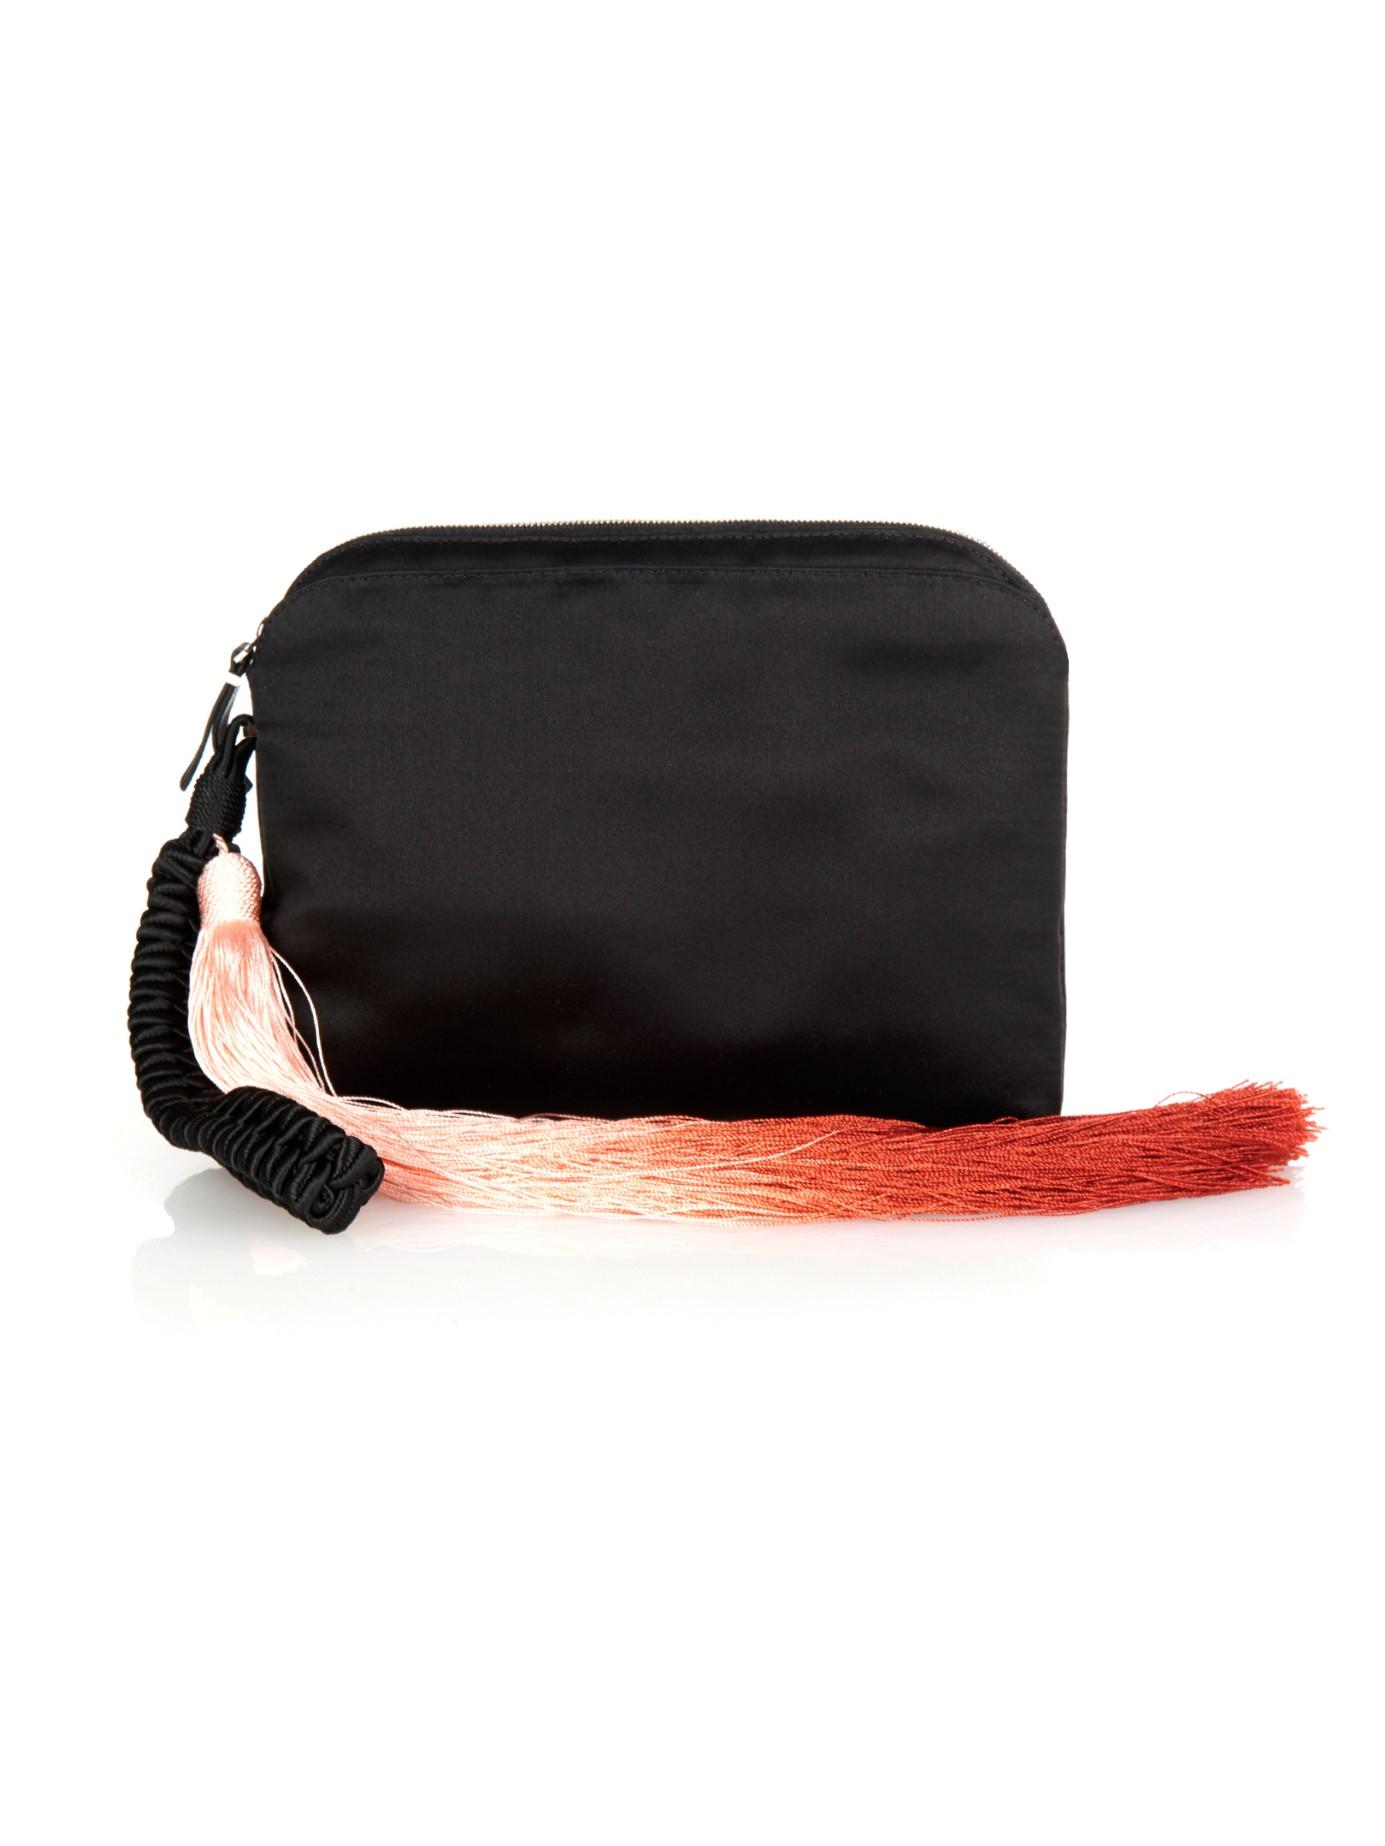 The Row Satin Tassel Wristlet Clutch Bag xVeI9R2